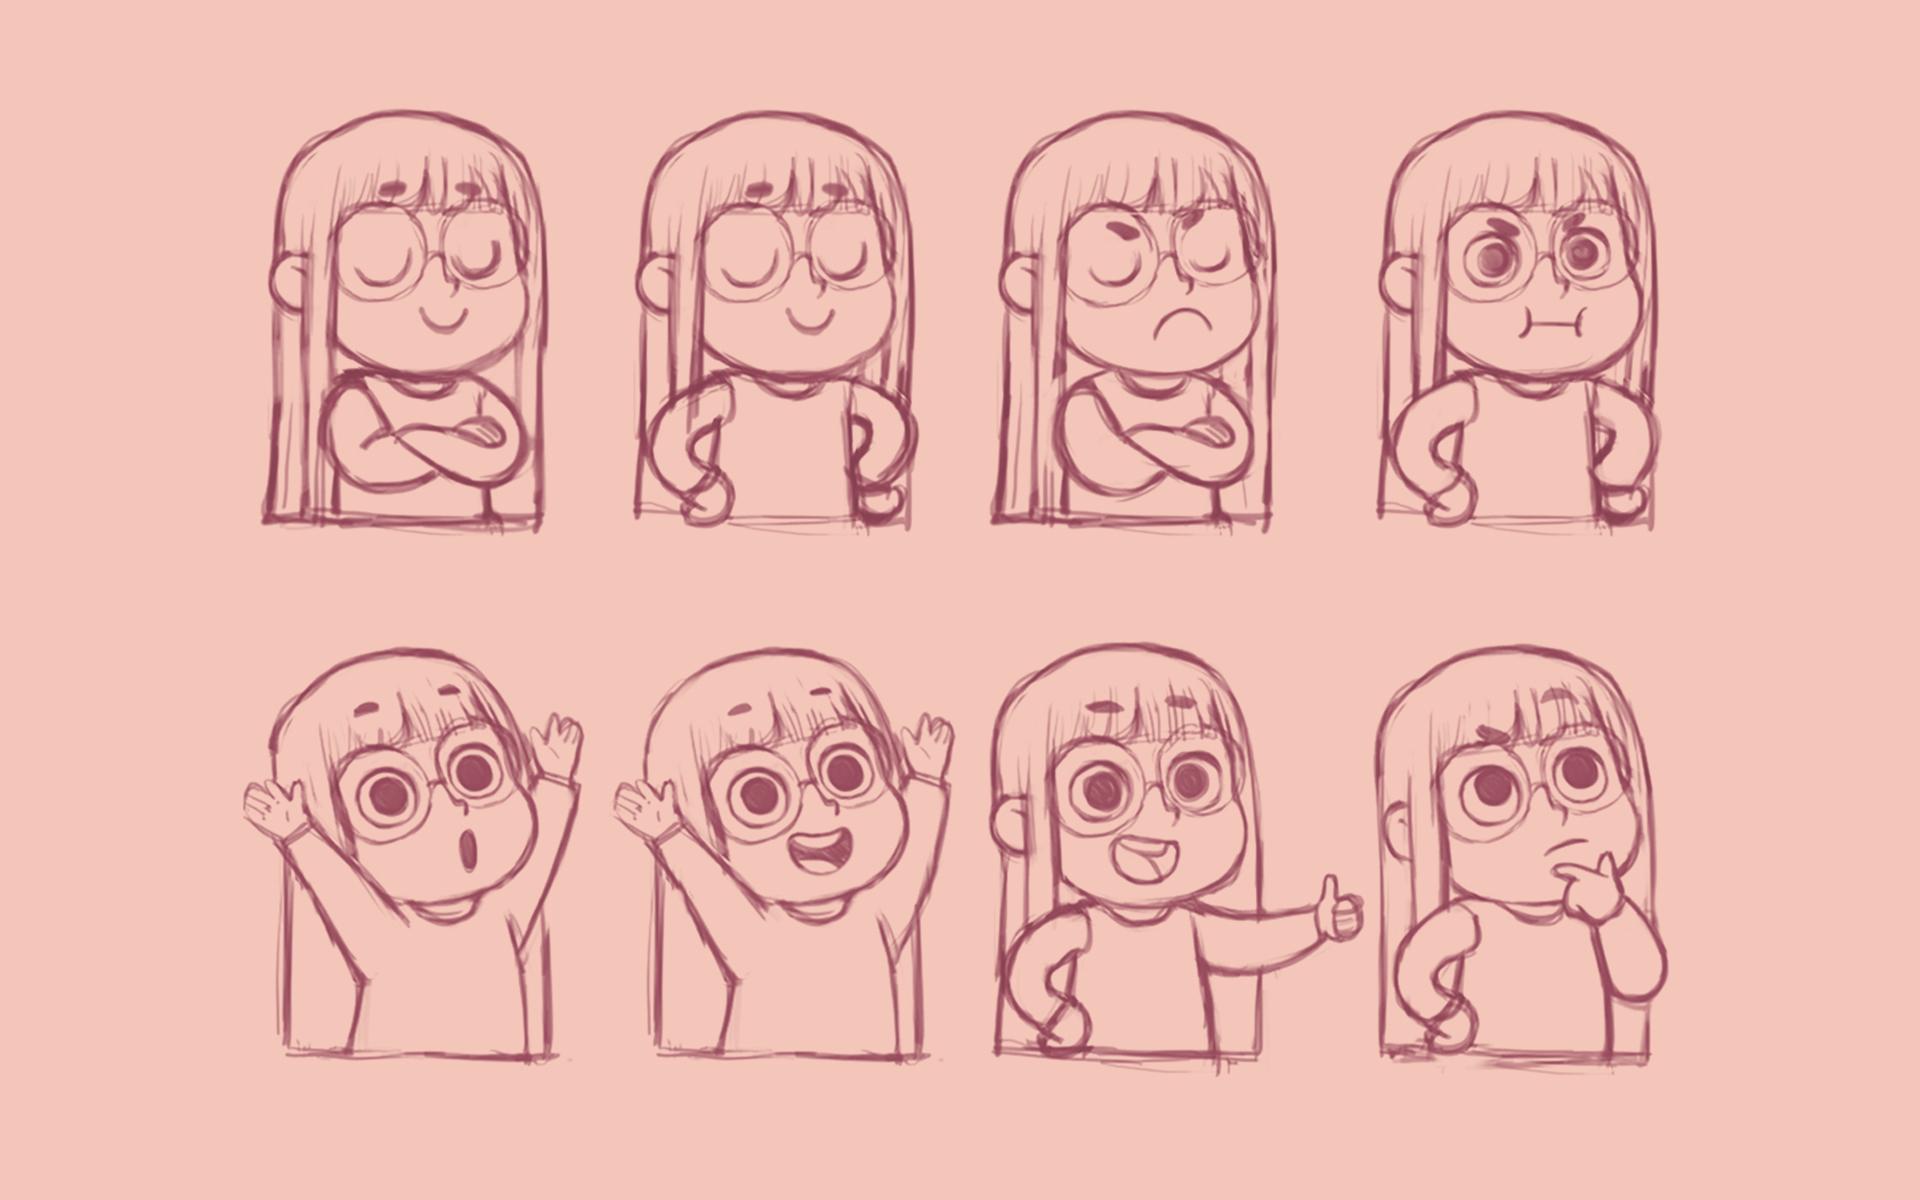 Stickers03